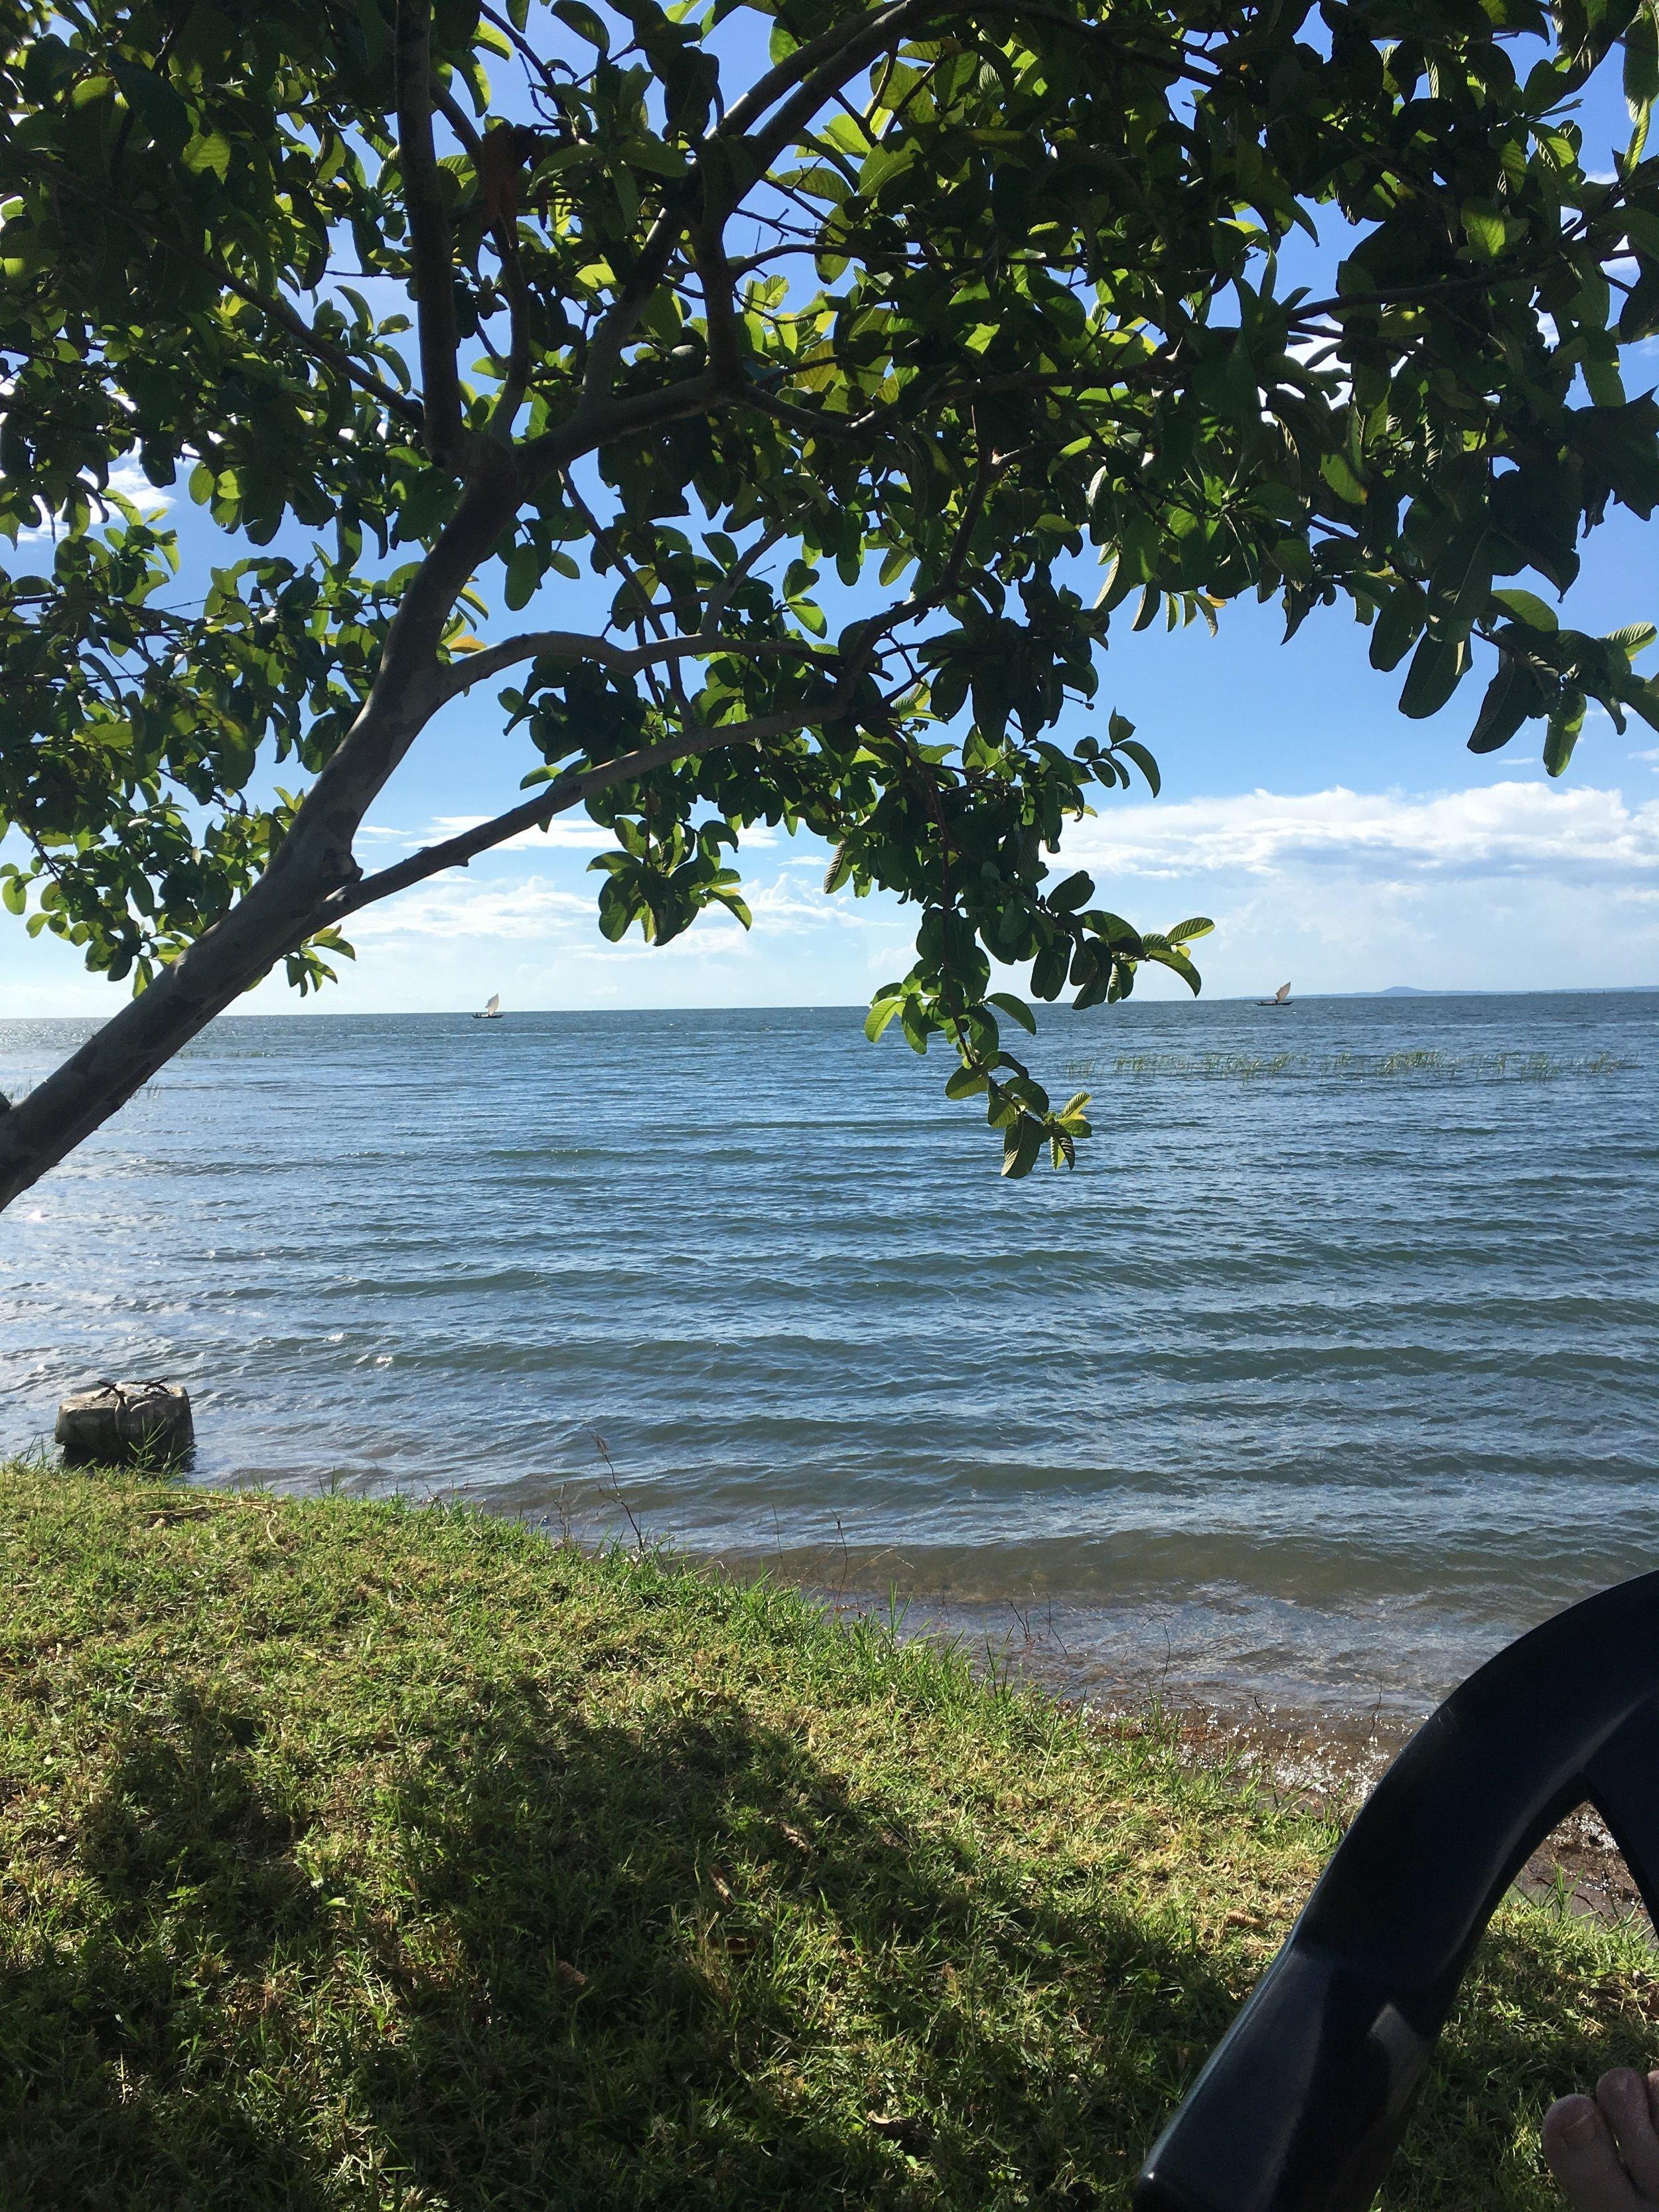 Lake Victoria from Rusinga island